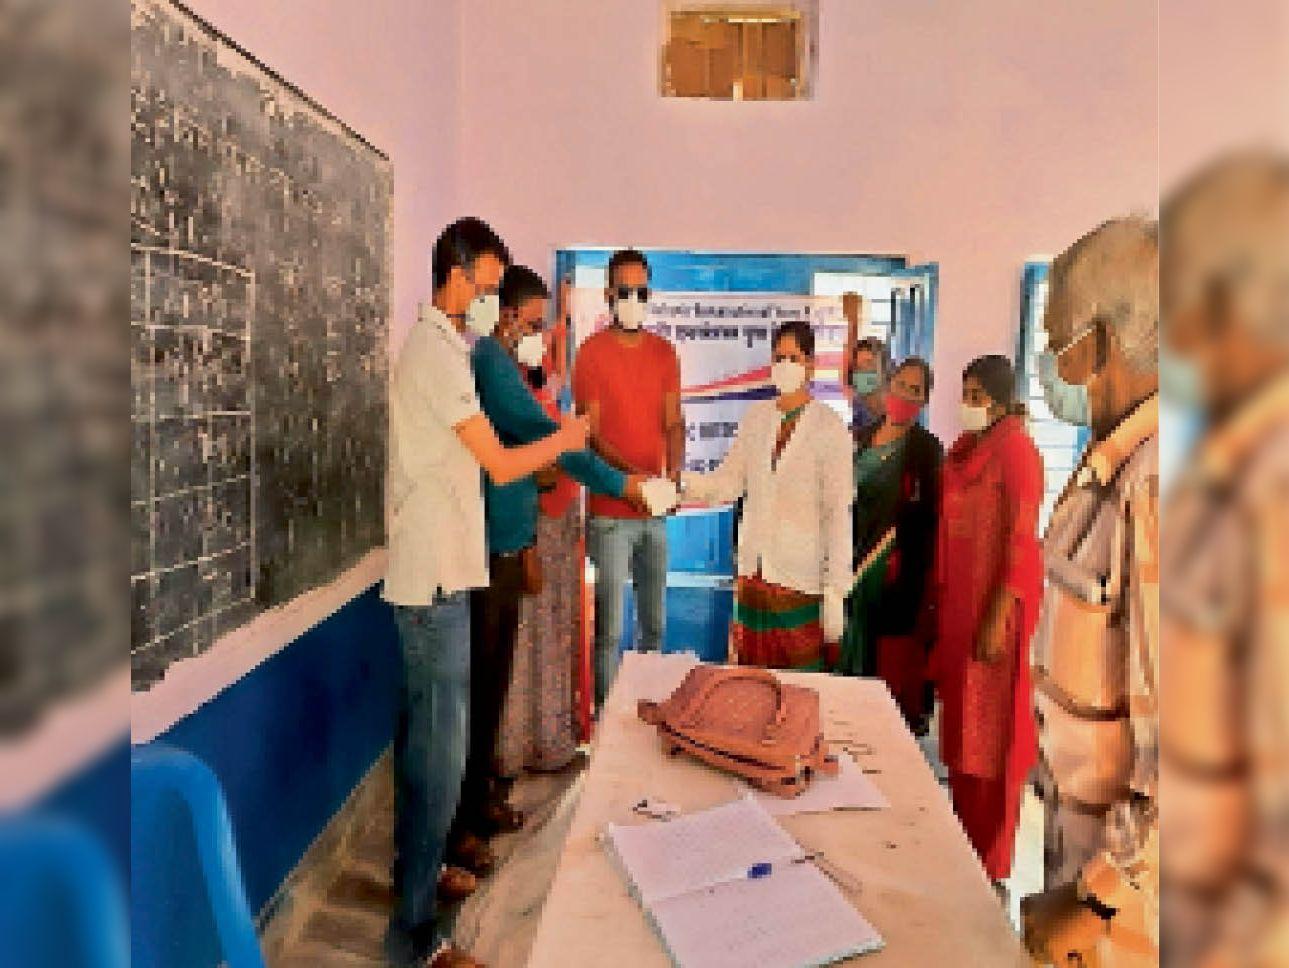 महावीर युवा इंटरनेशनल की ओर से मास्क वितरण किए। - Dainik Bhaskar